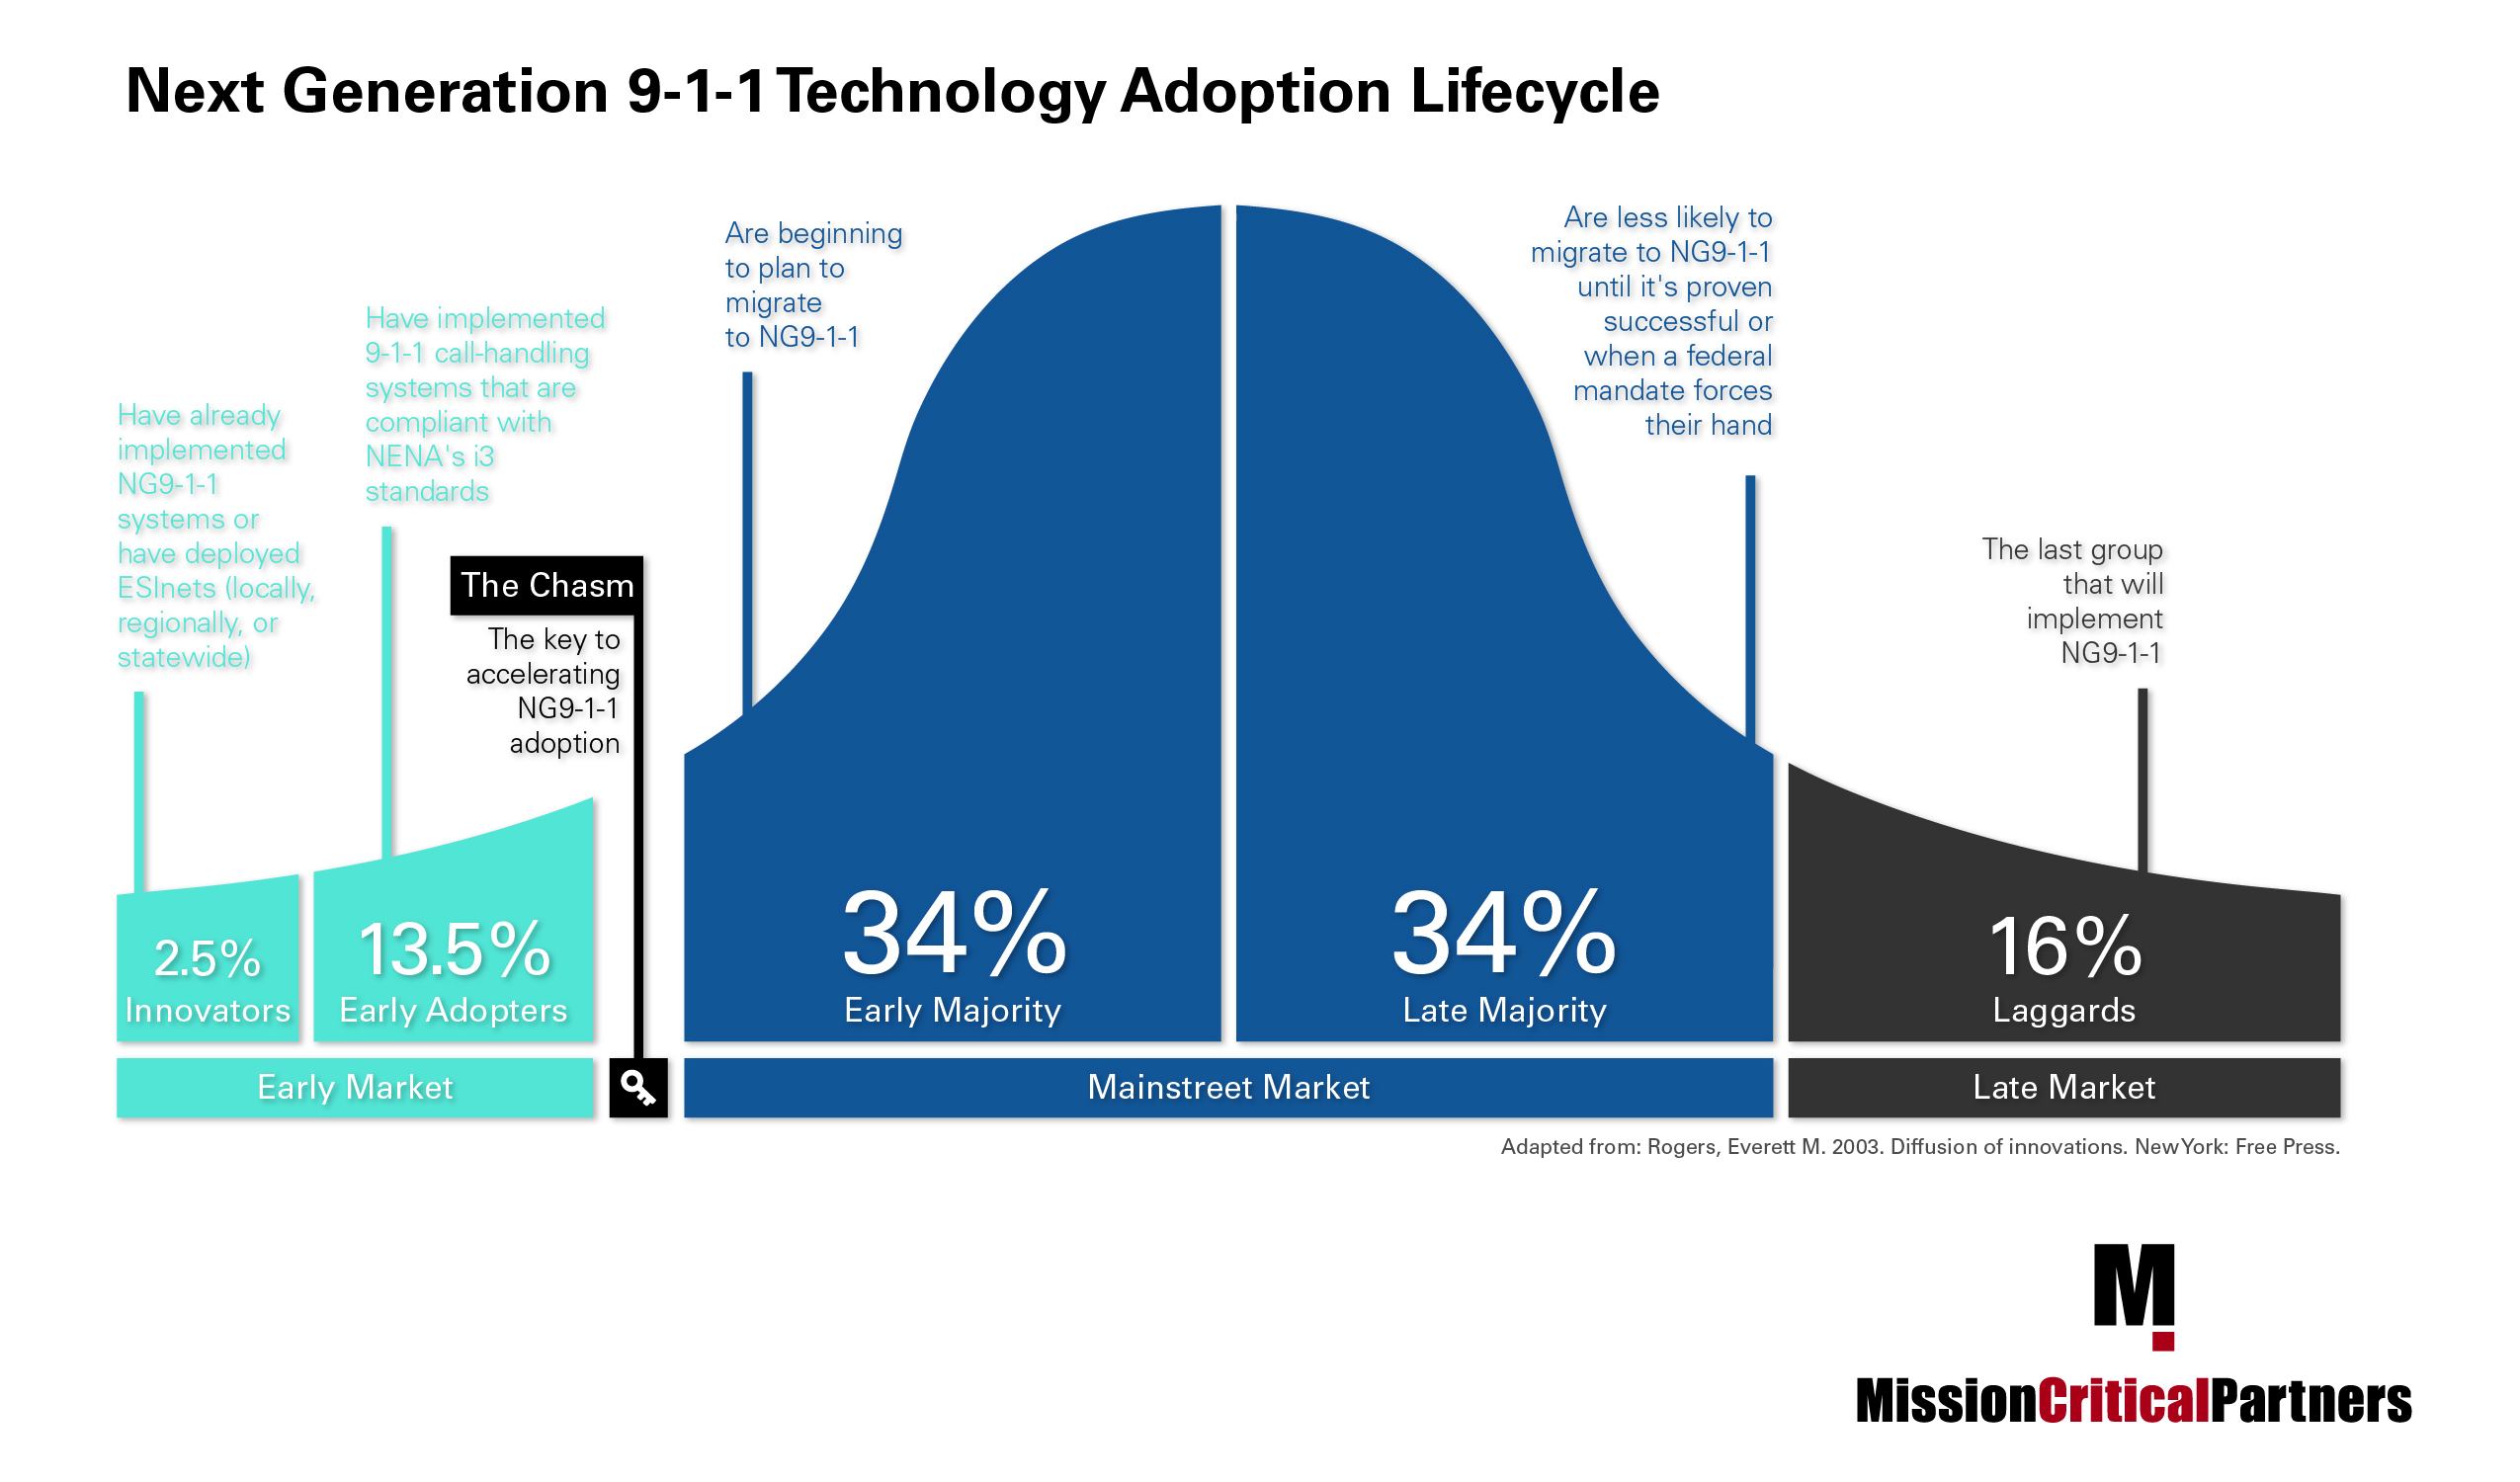 Next Generation 911 Tech Adoption Lifecycle